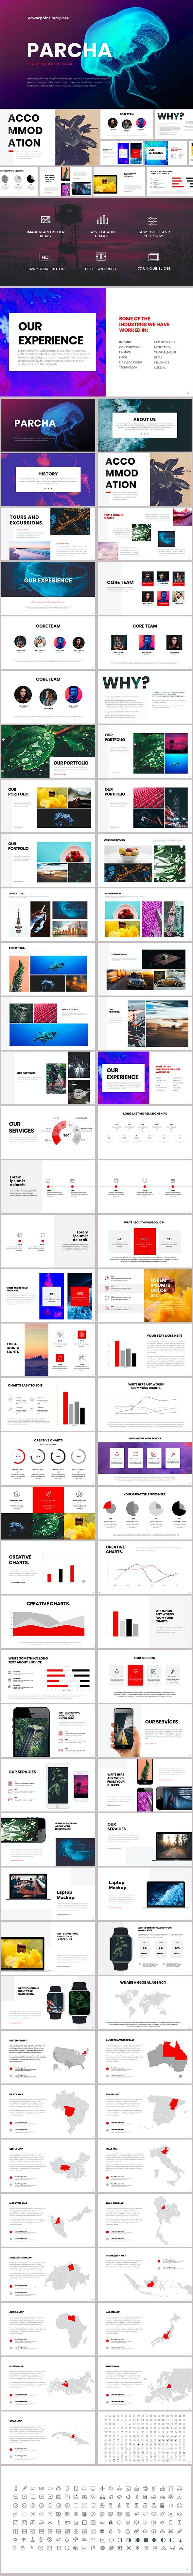 Parcha Powerpoint Template - PowerPoint Templates Presentation Templates